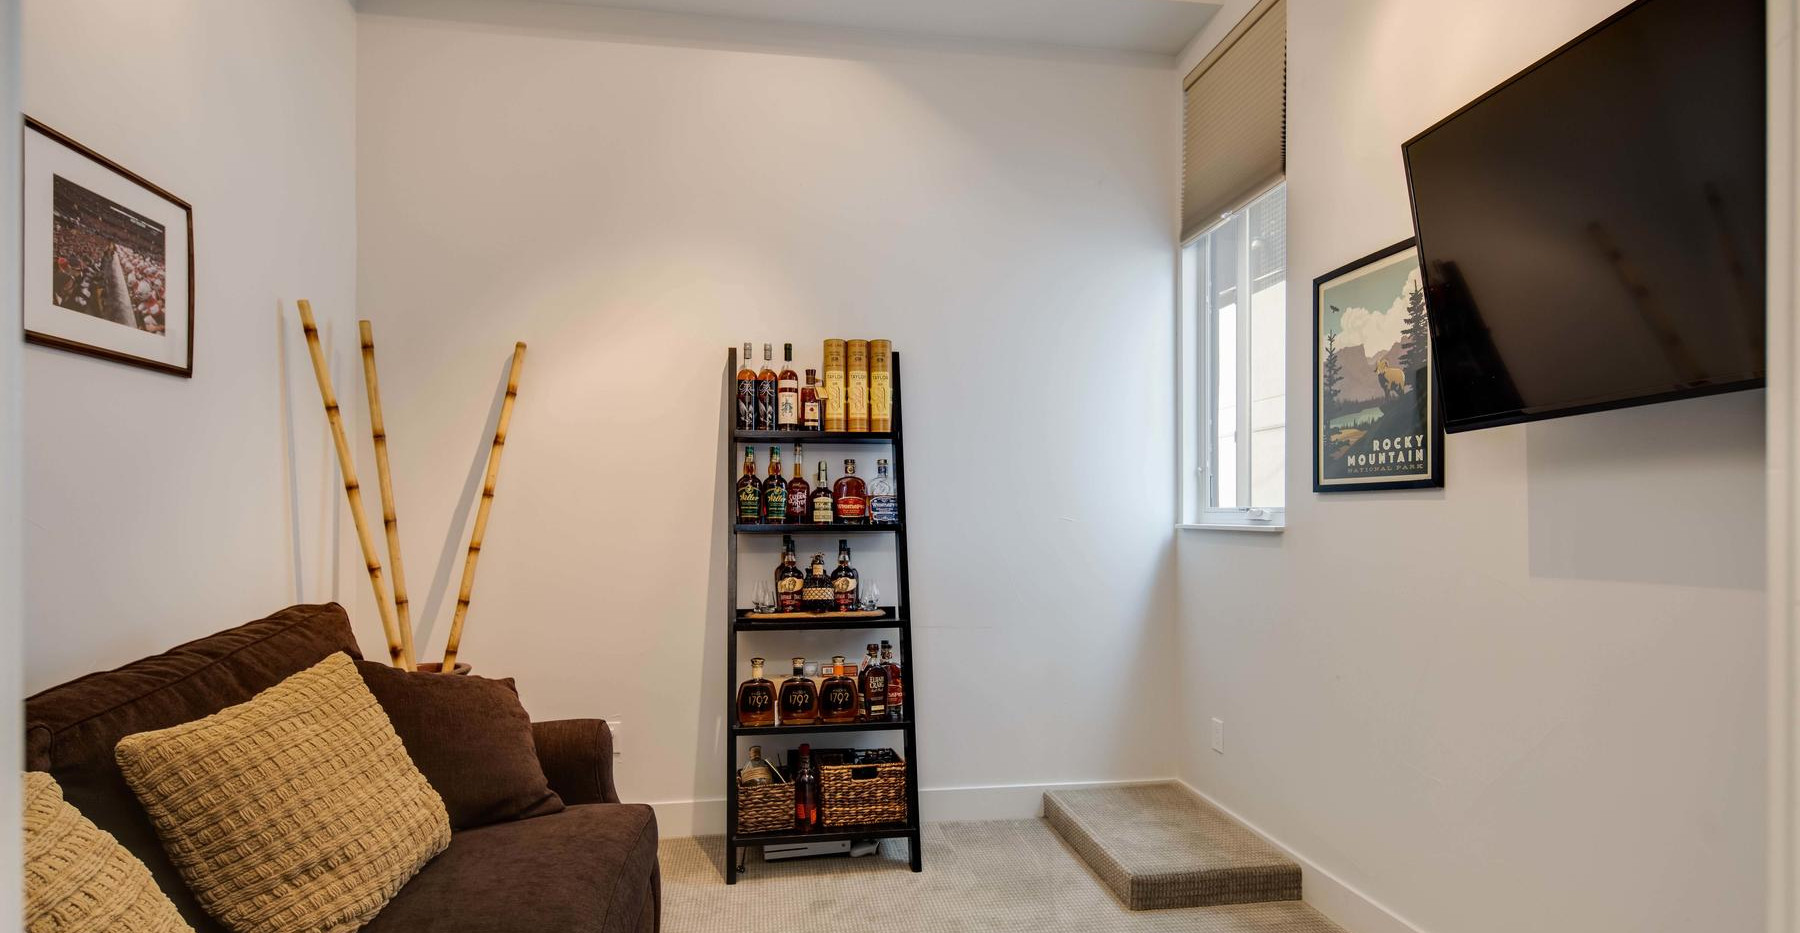 3434 Tejon Street-018-014-Bedroom-MLS_Si